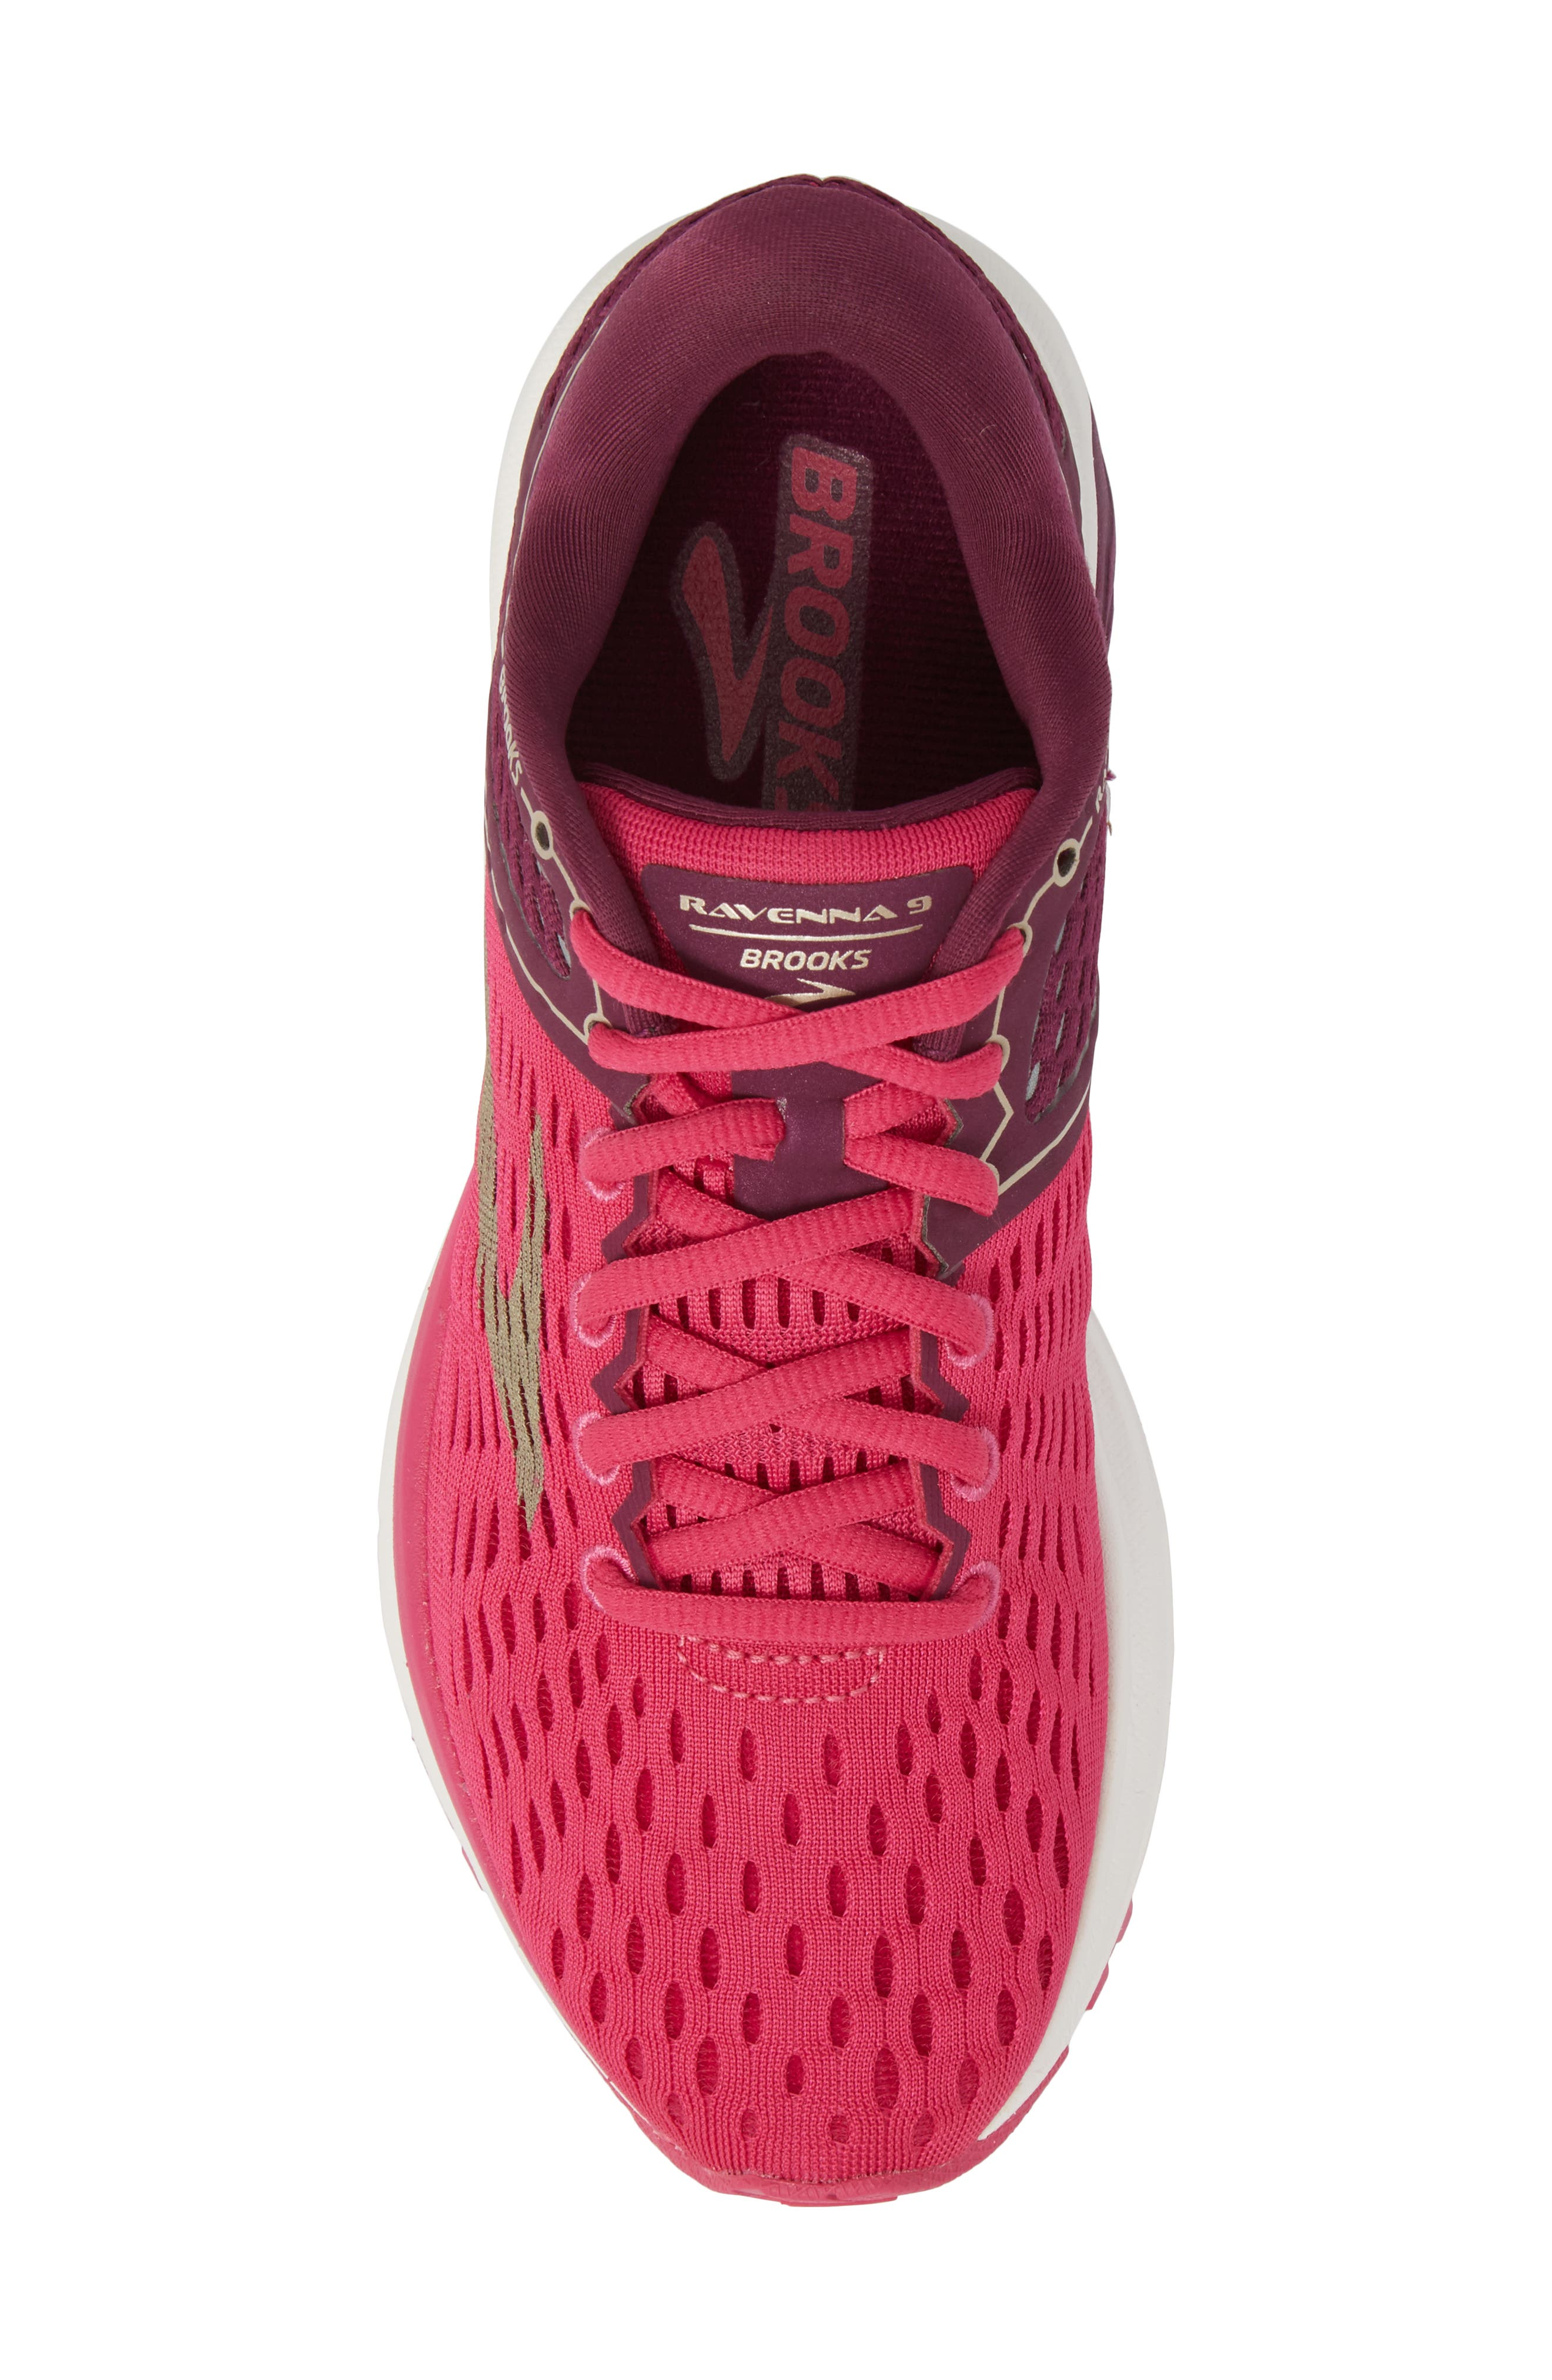 Ravenna 9 Running Shoe,                             Alternate thumbnail 5, color,                             Pink/ Plum/ Champagne